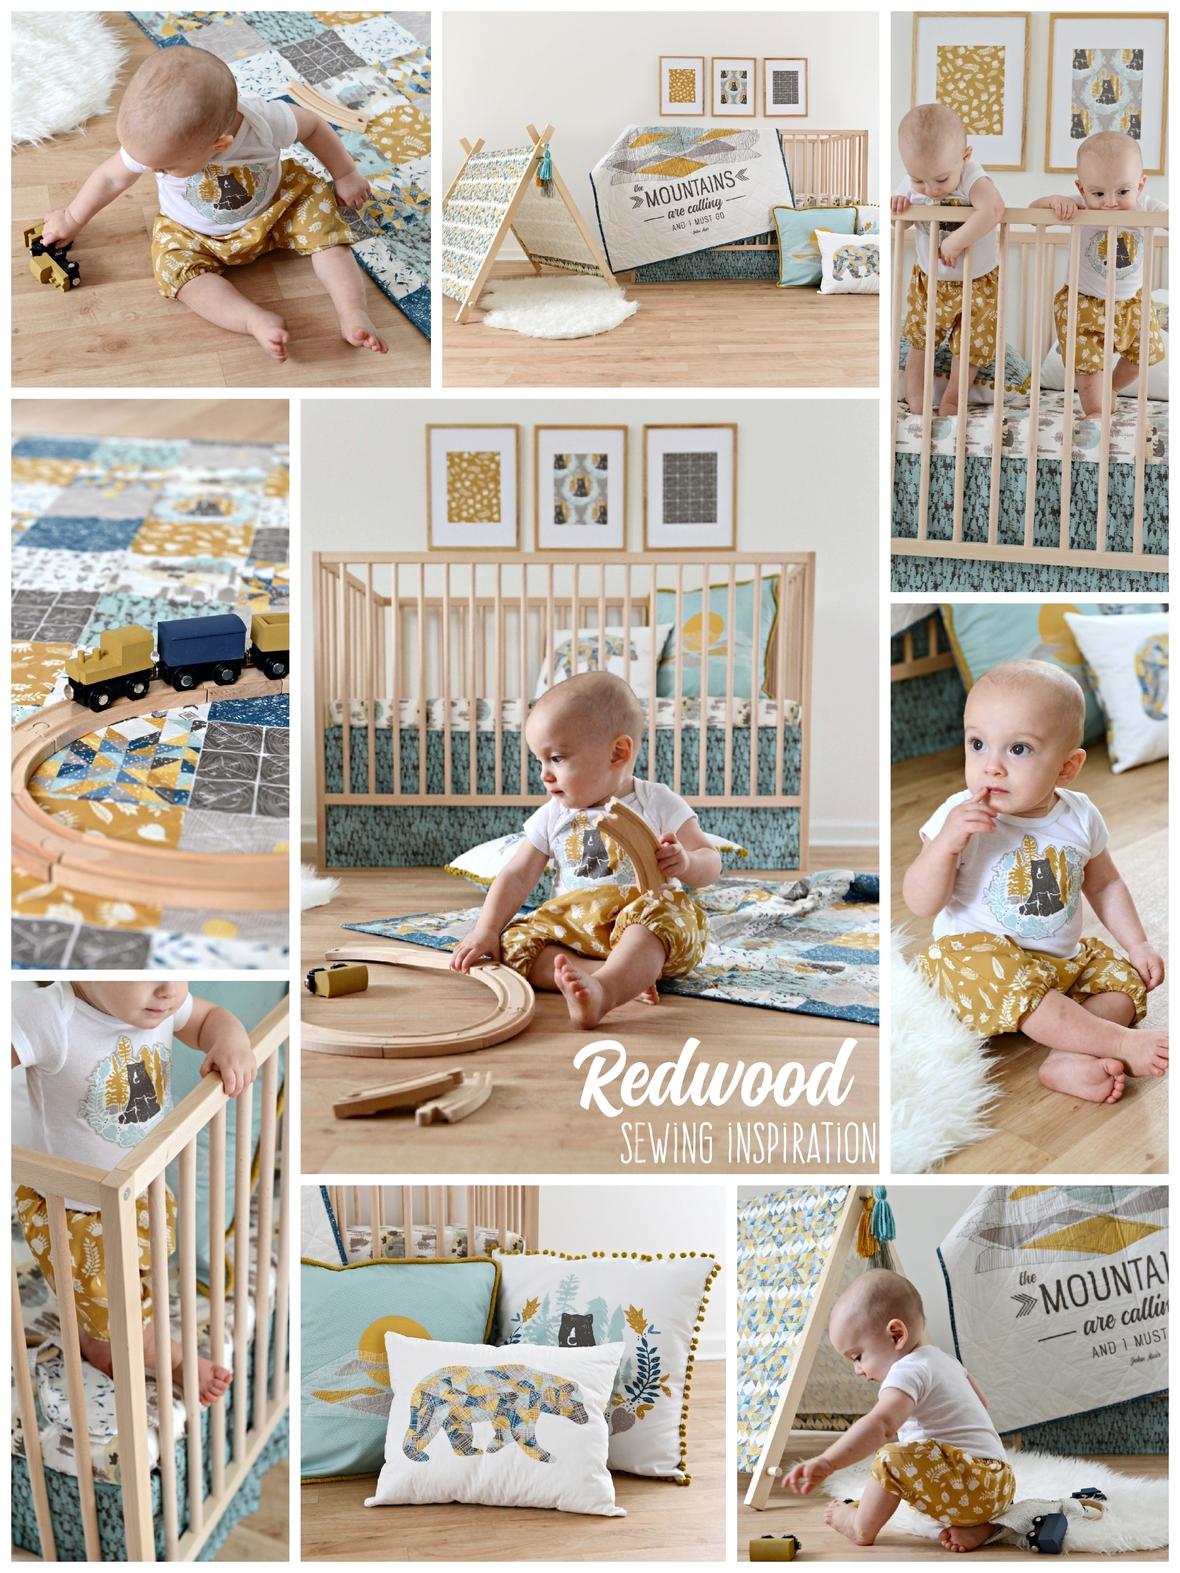 Redwood fabric boy nursery sewing inspiration